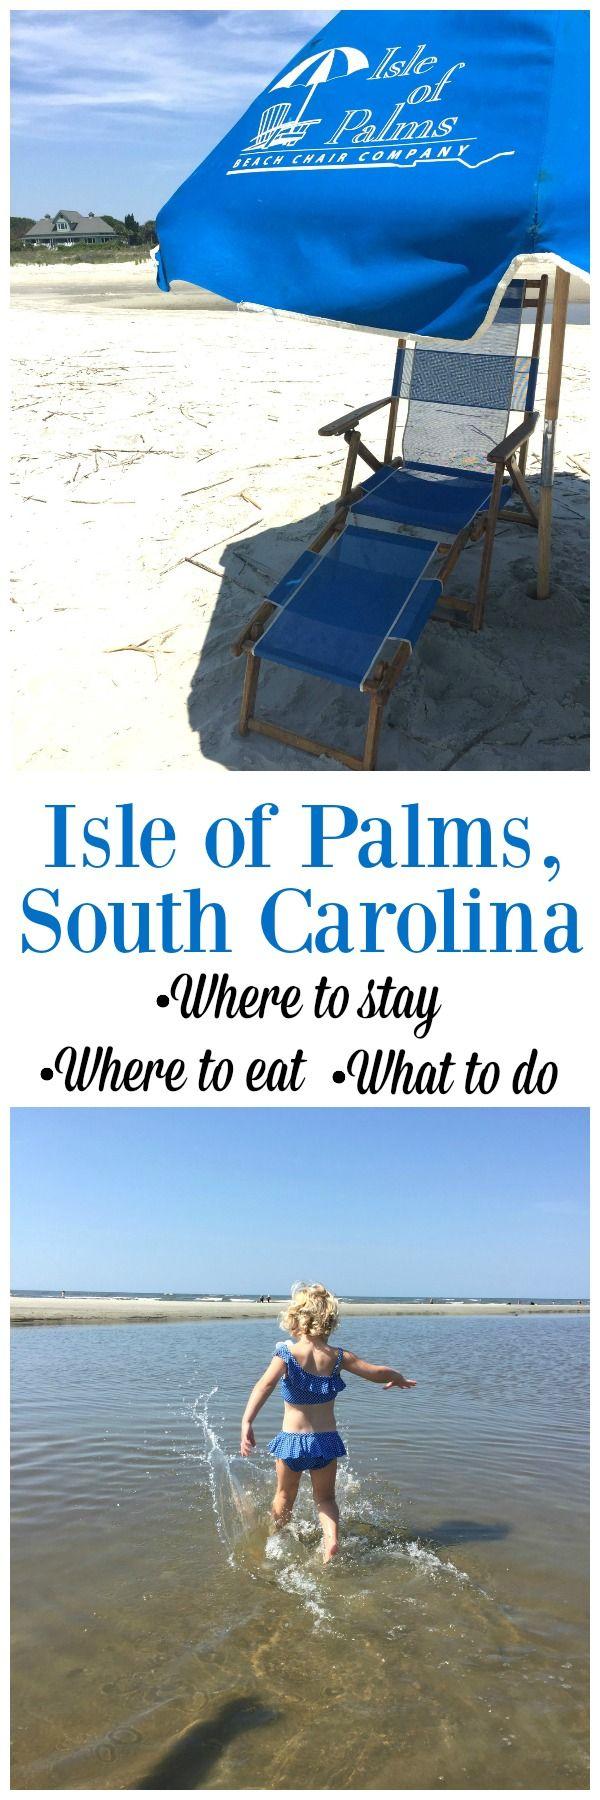 Isle Of Palms Beach, South Carolina: Where To Stay, Eat